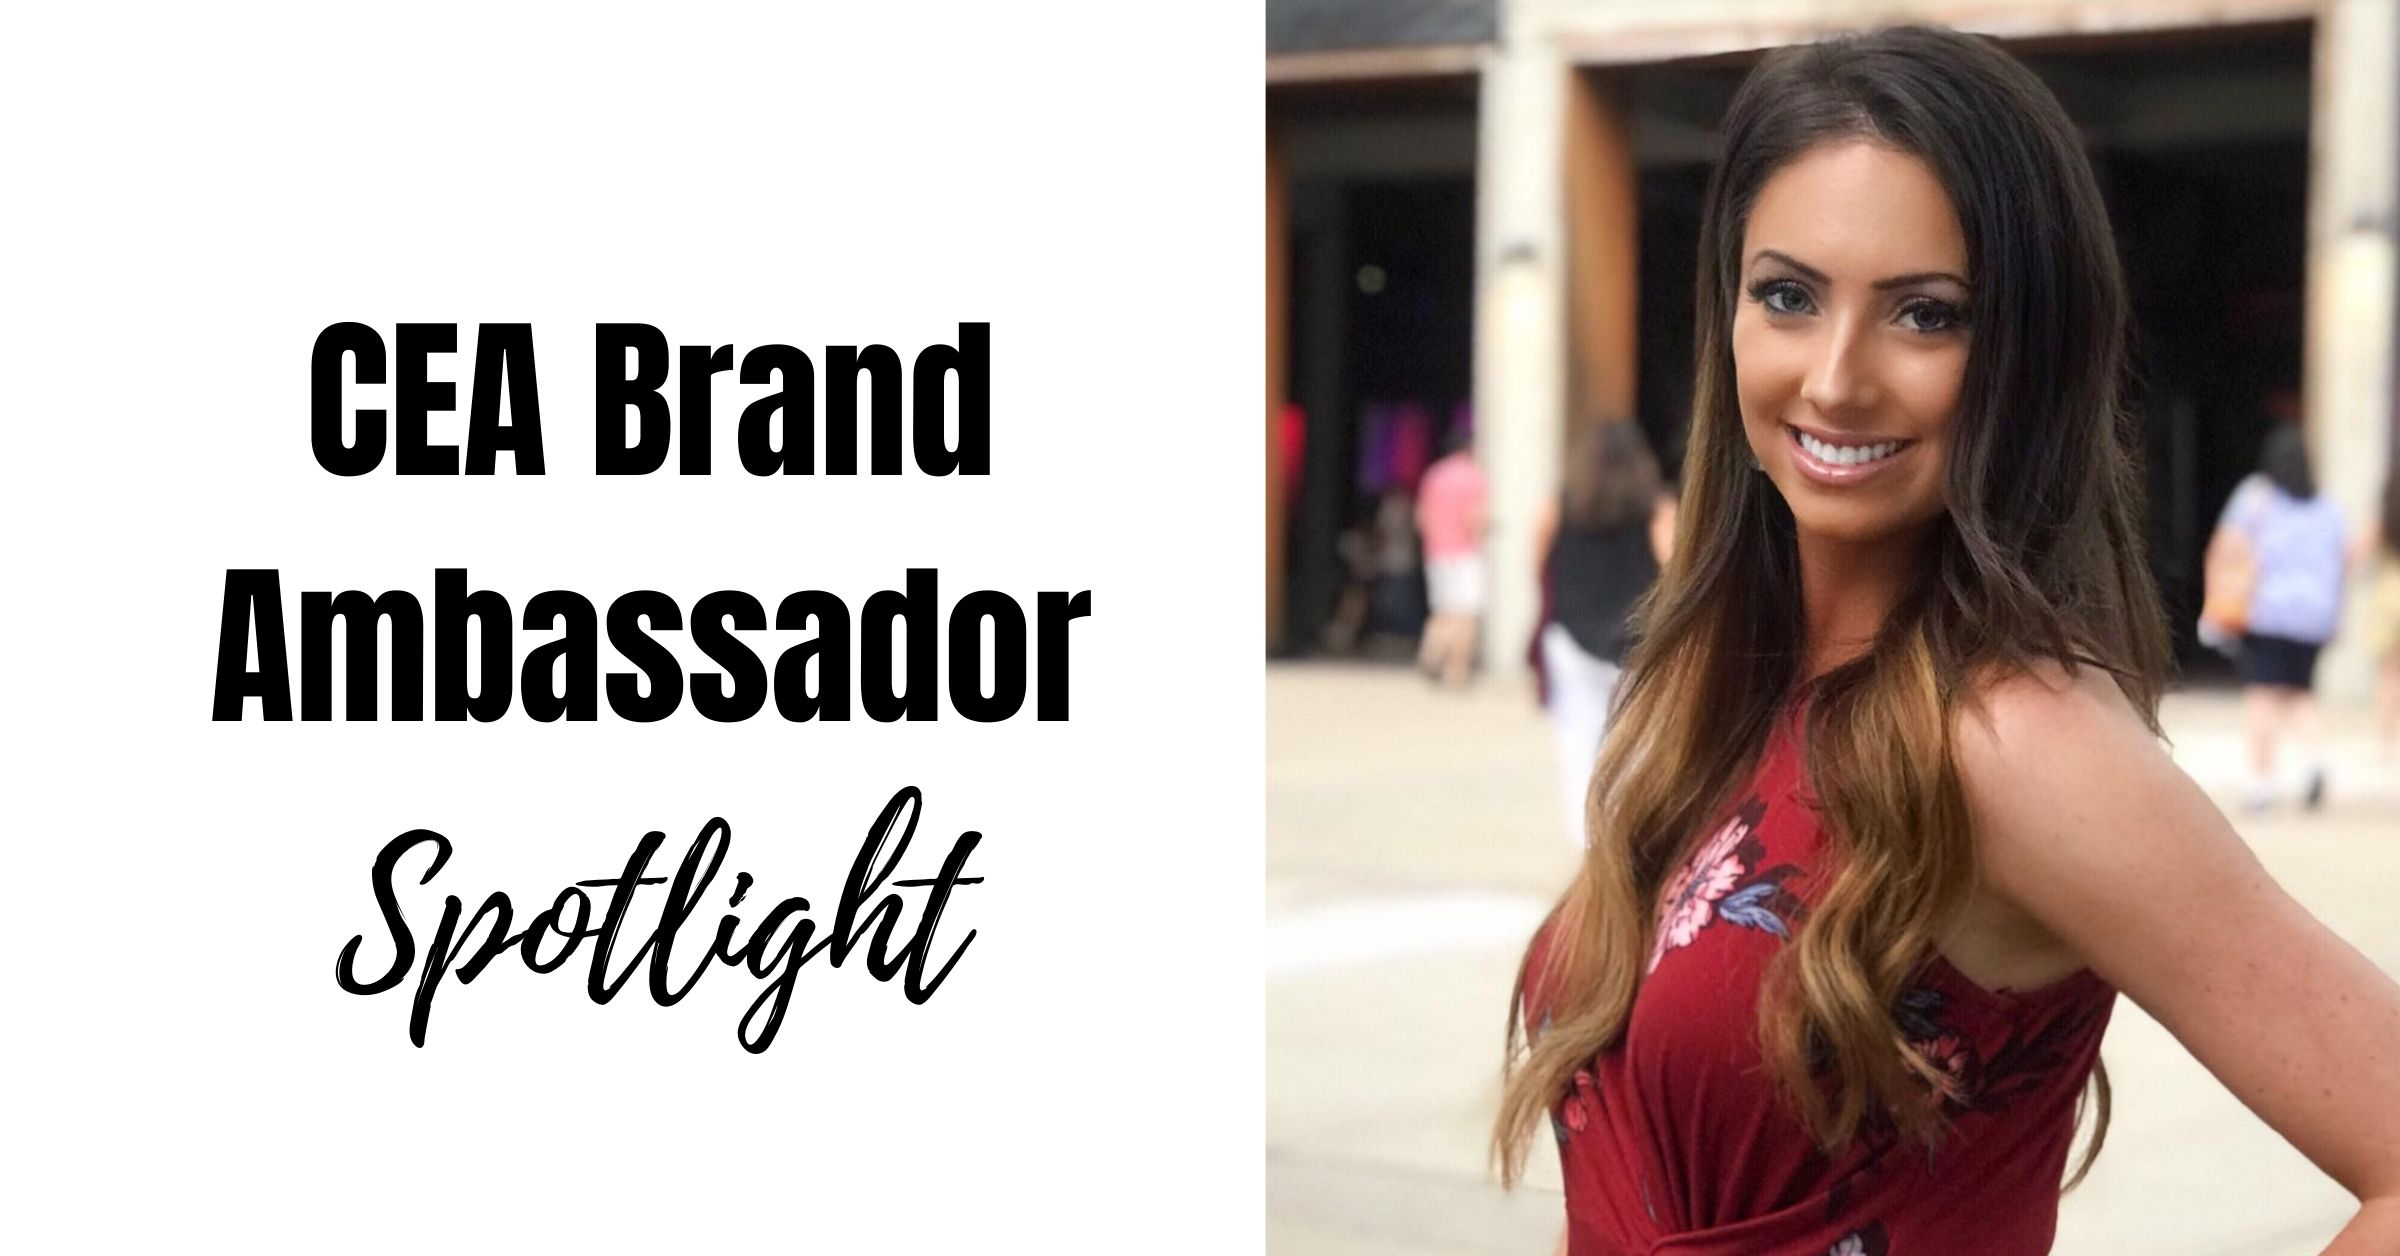 Holly brand ambassador chicago cea staffing www.ceastaffing.com